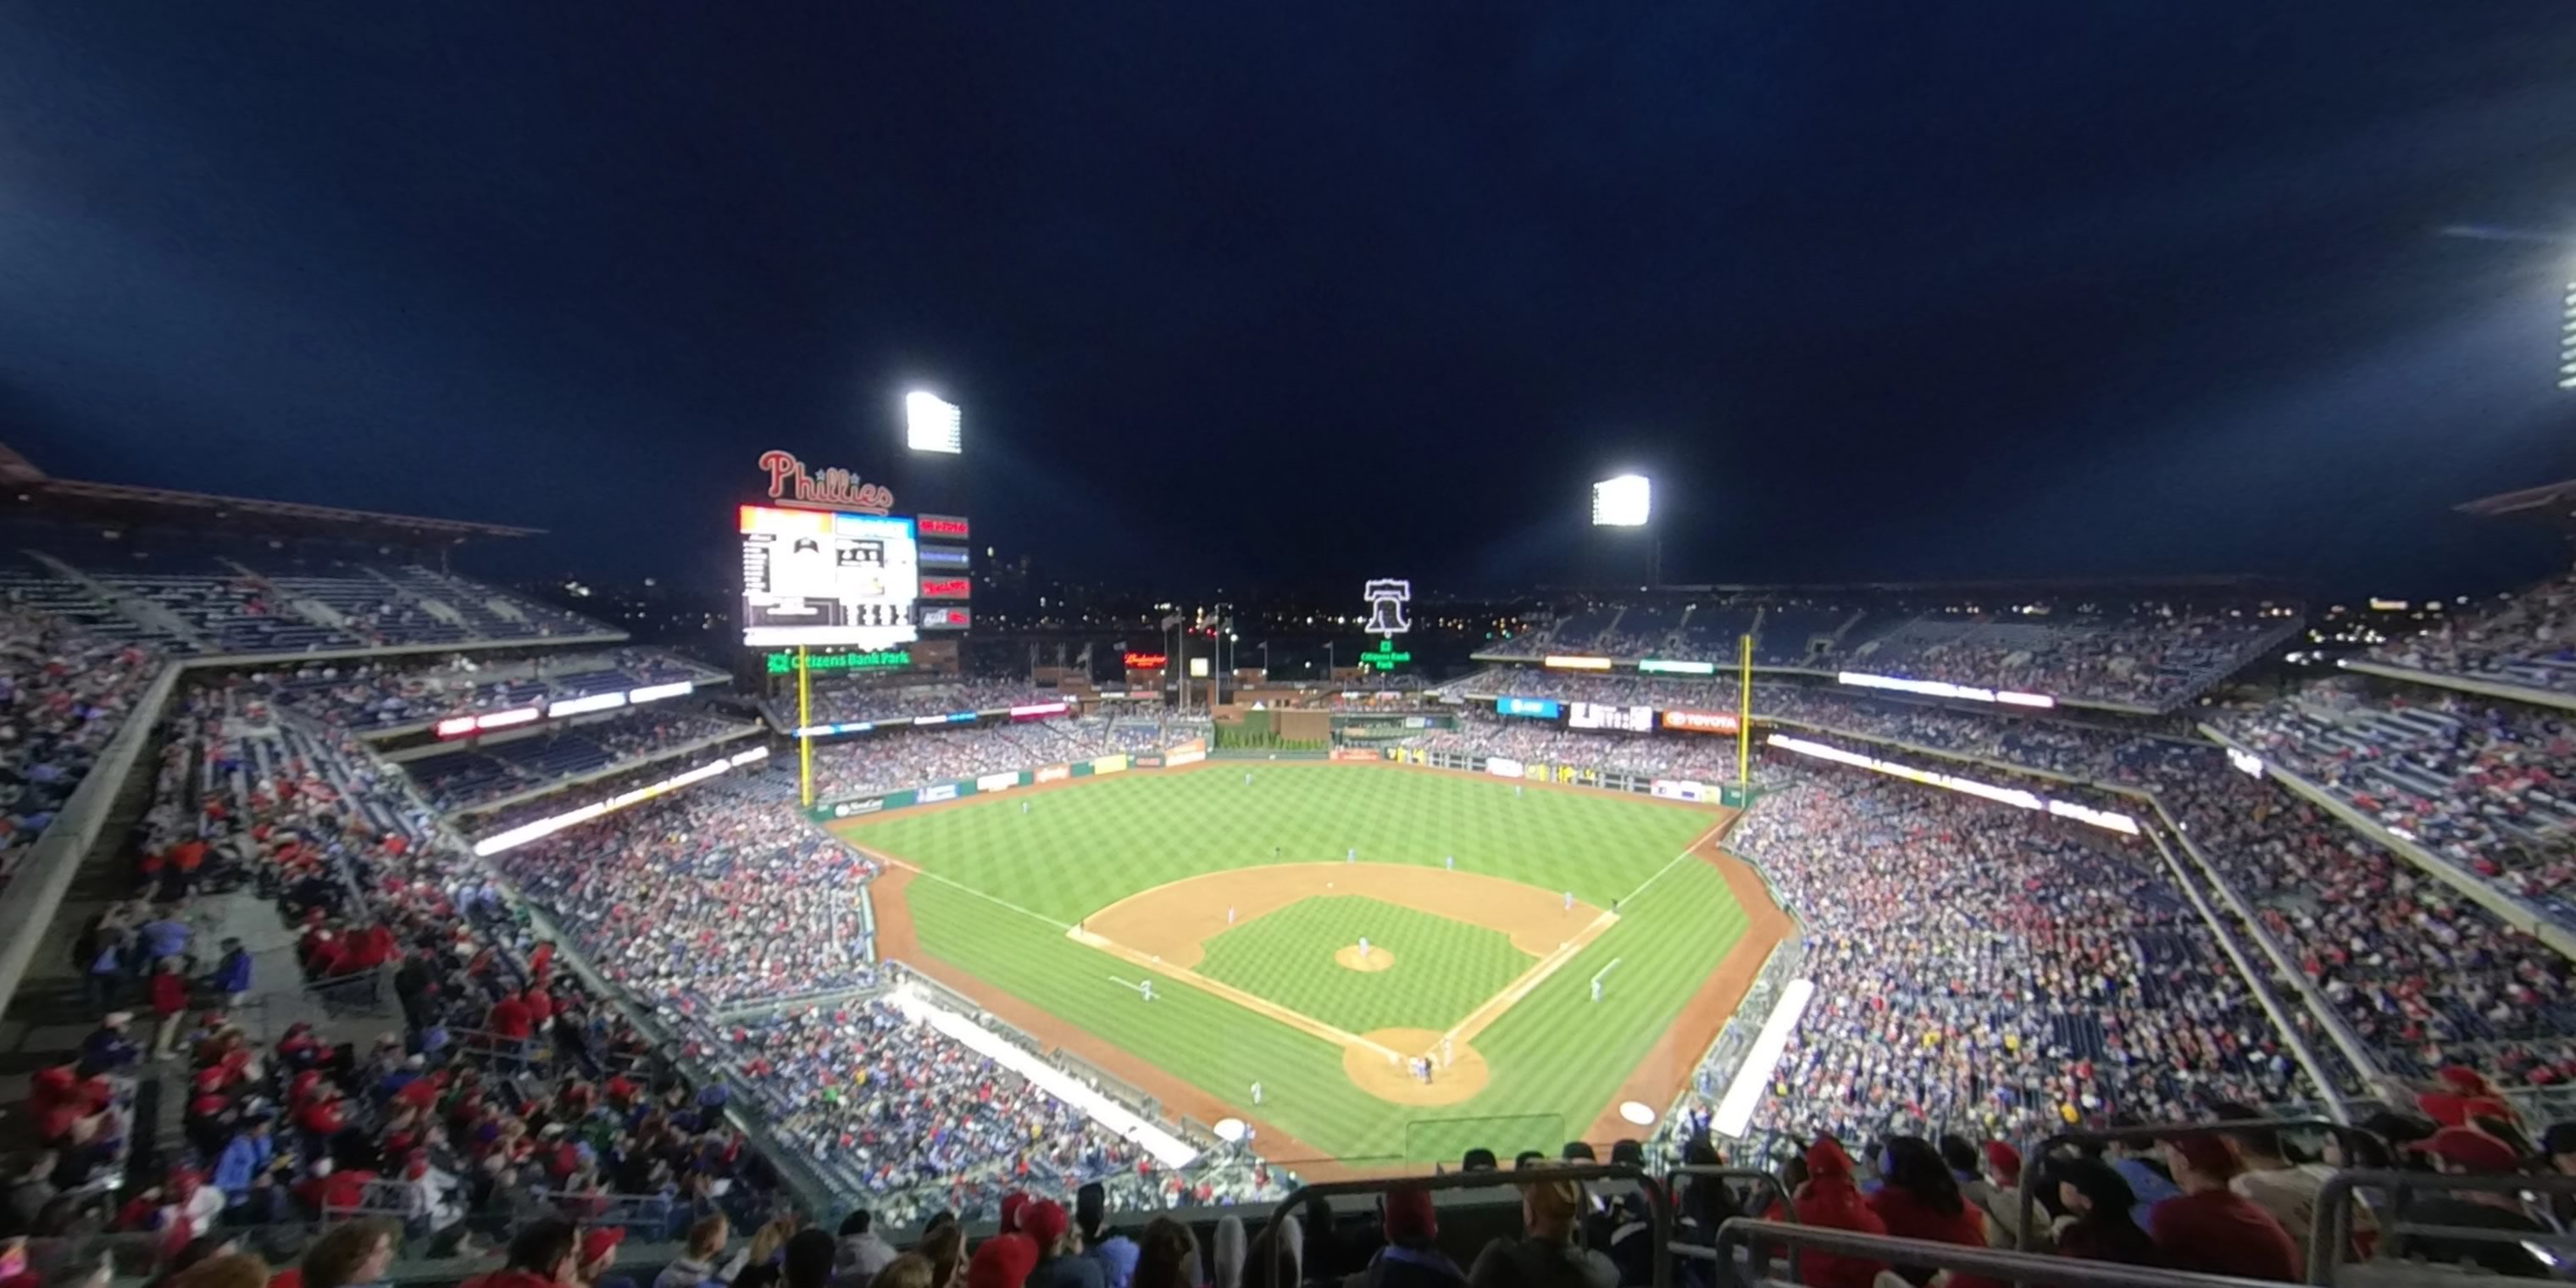 Section 422 at Citizens Bank Park - Philadelphia Phillies ...